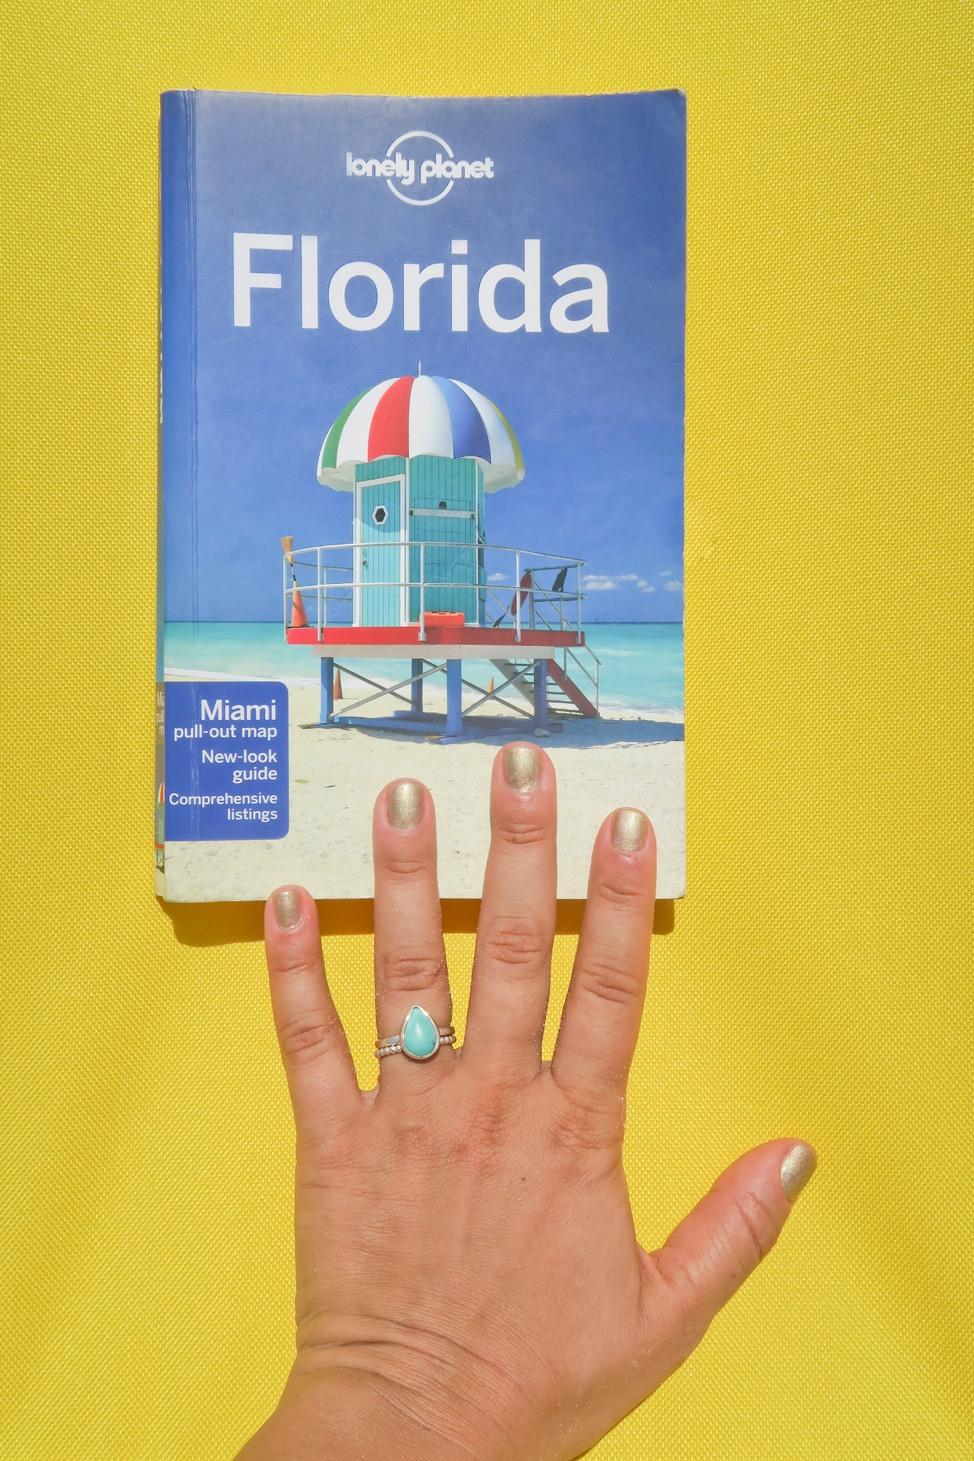 Sarasota Travel Blog Weekend